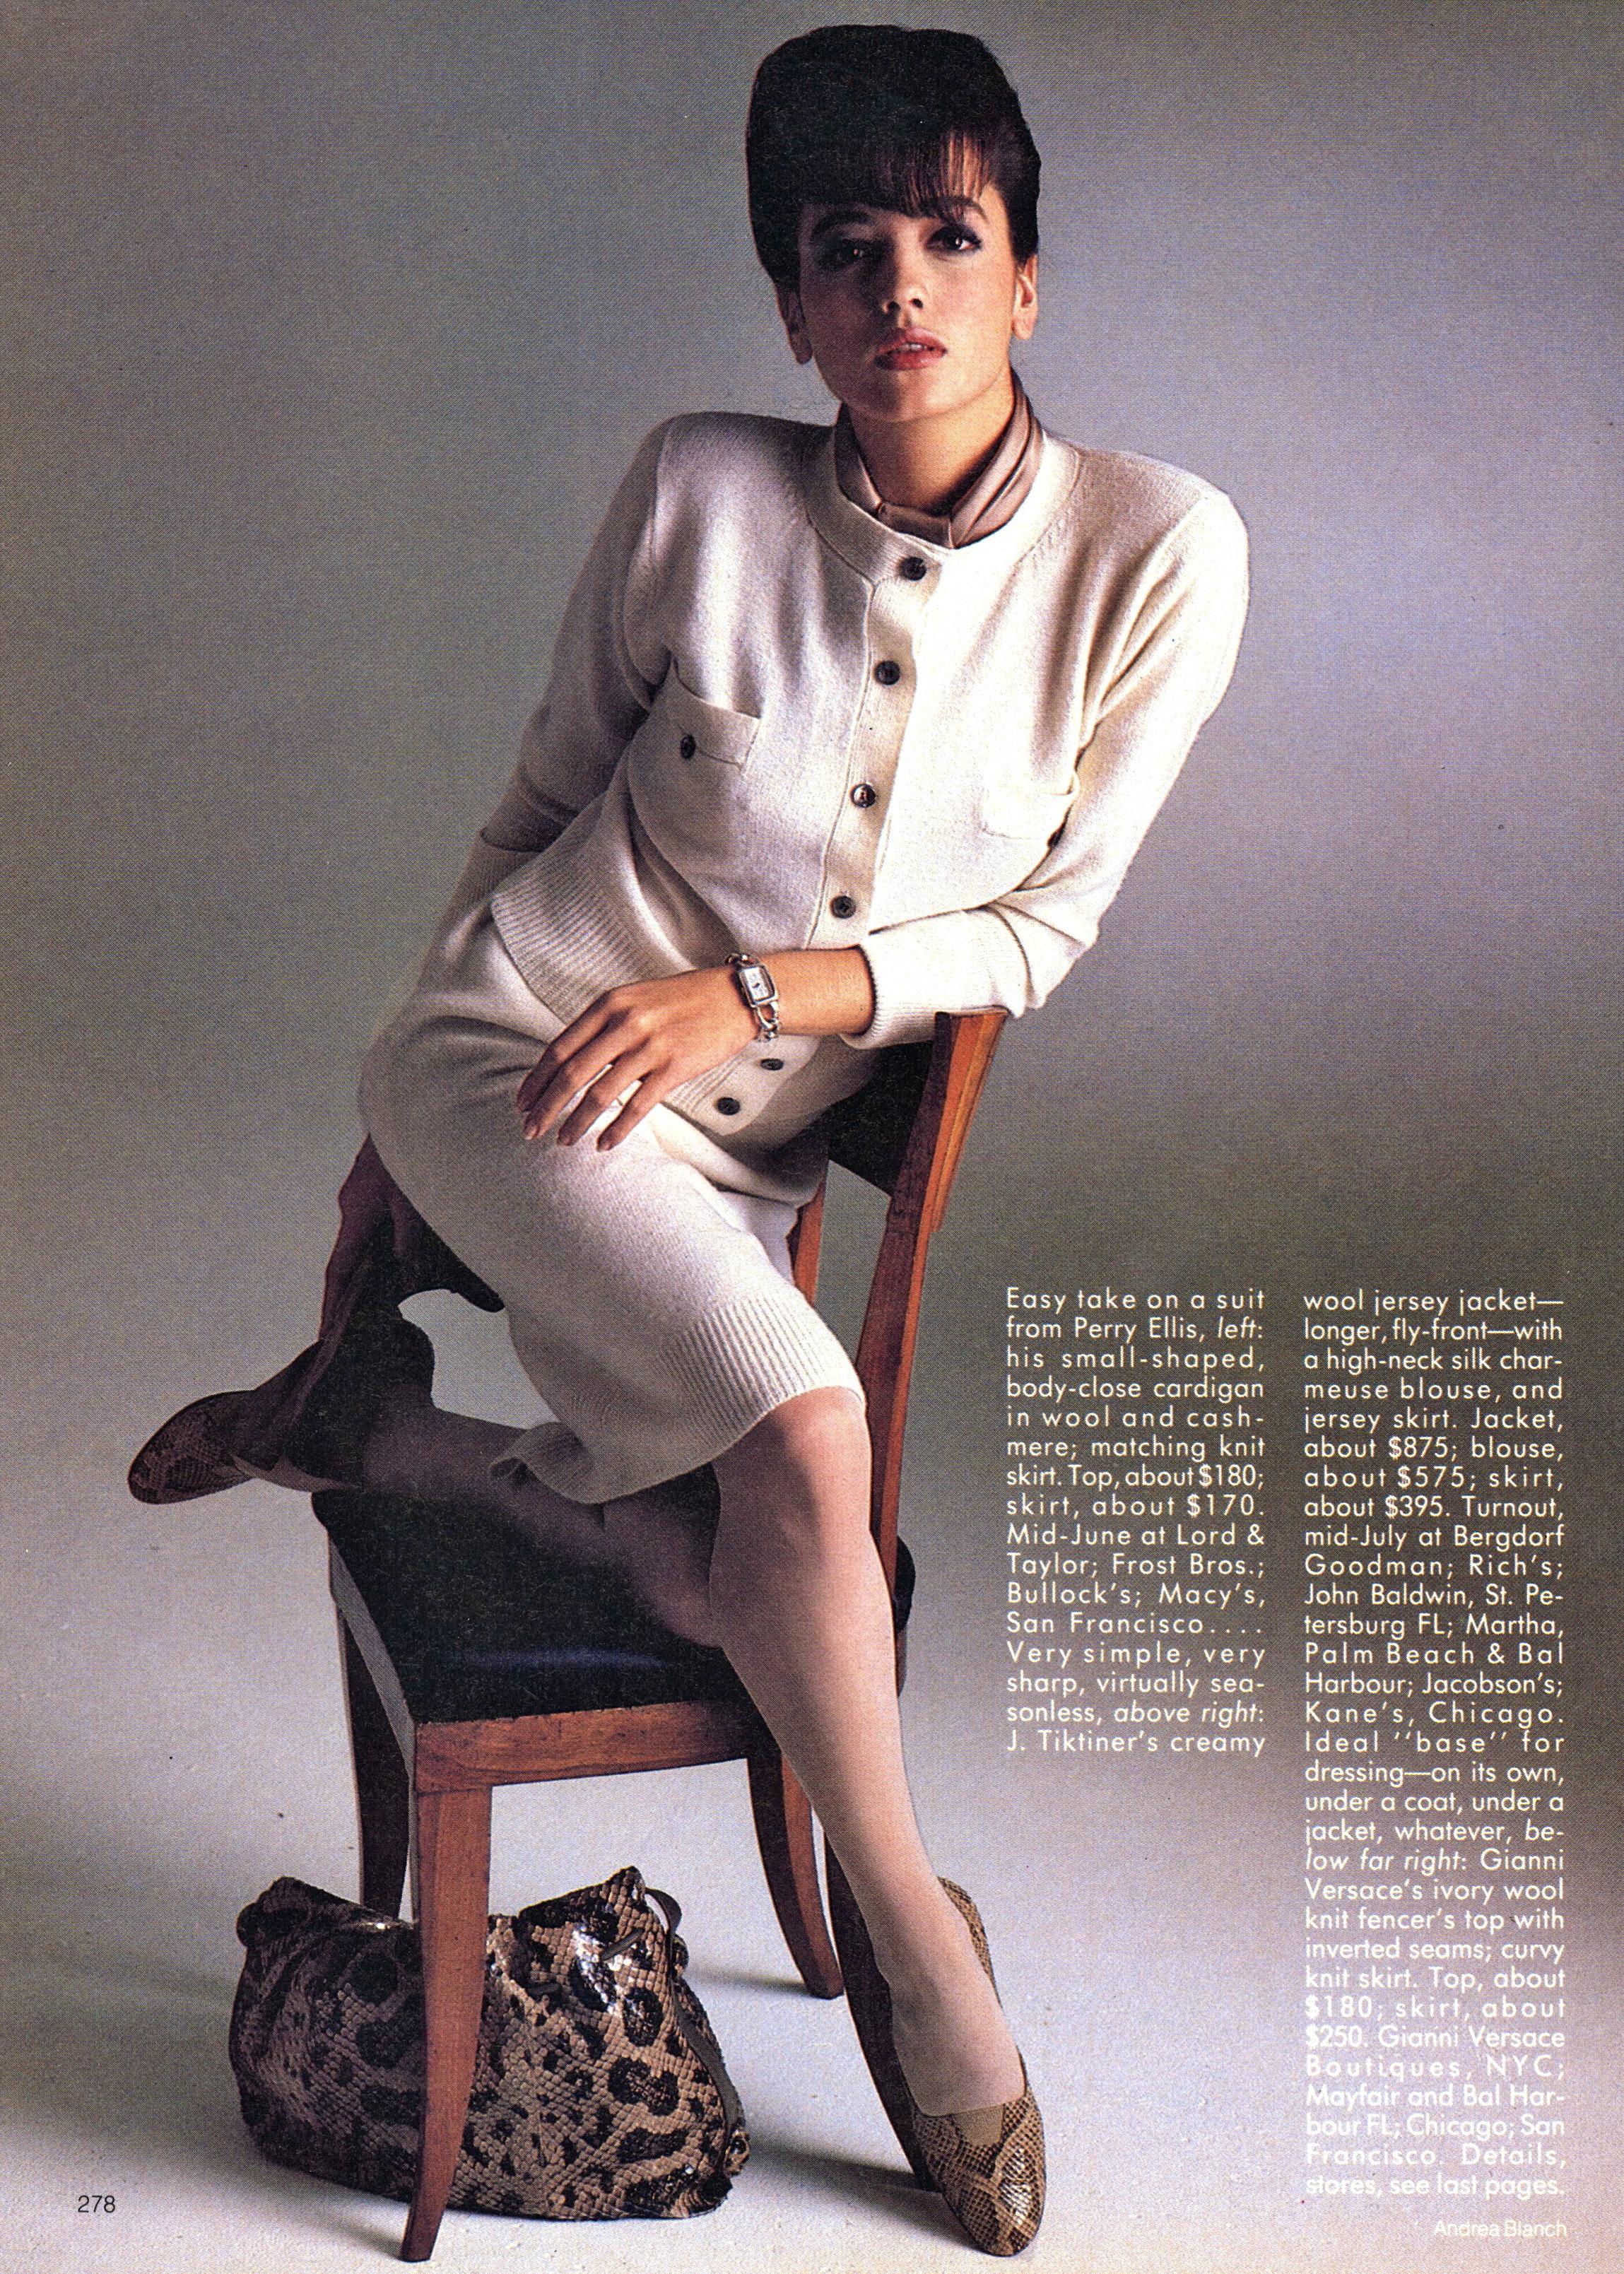 Vogue (US) June 1986 | Christy Turlington & Jose Toledo 07.jpg